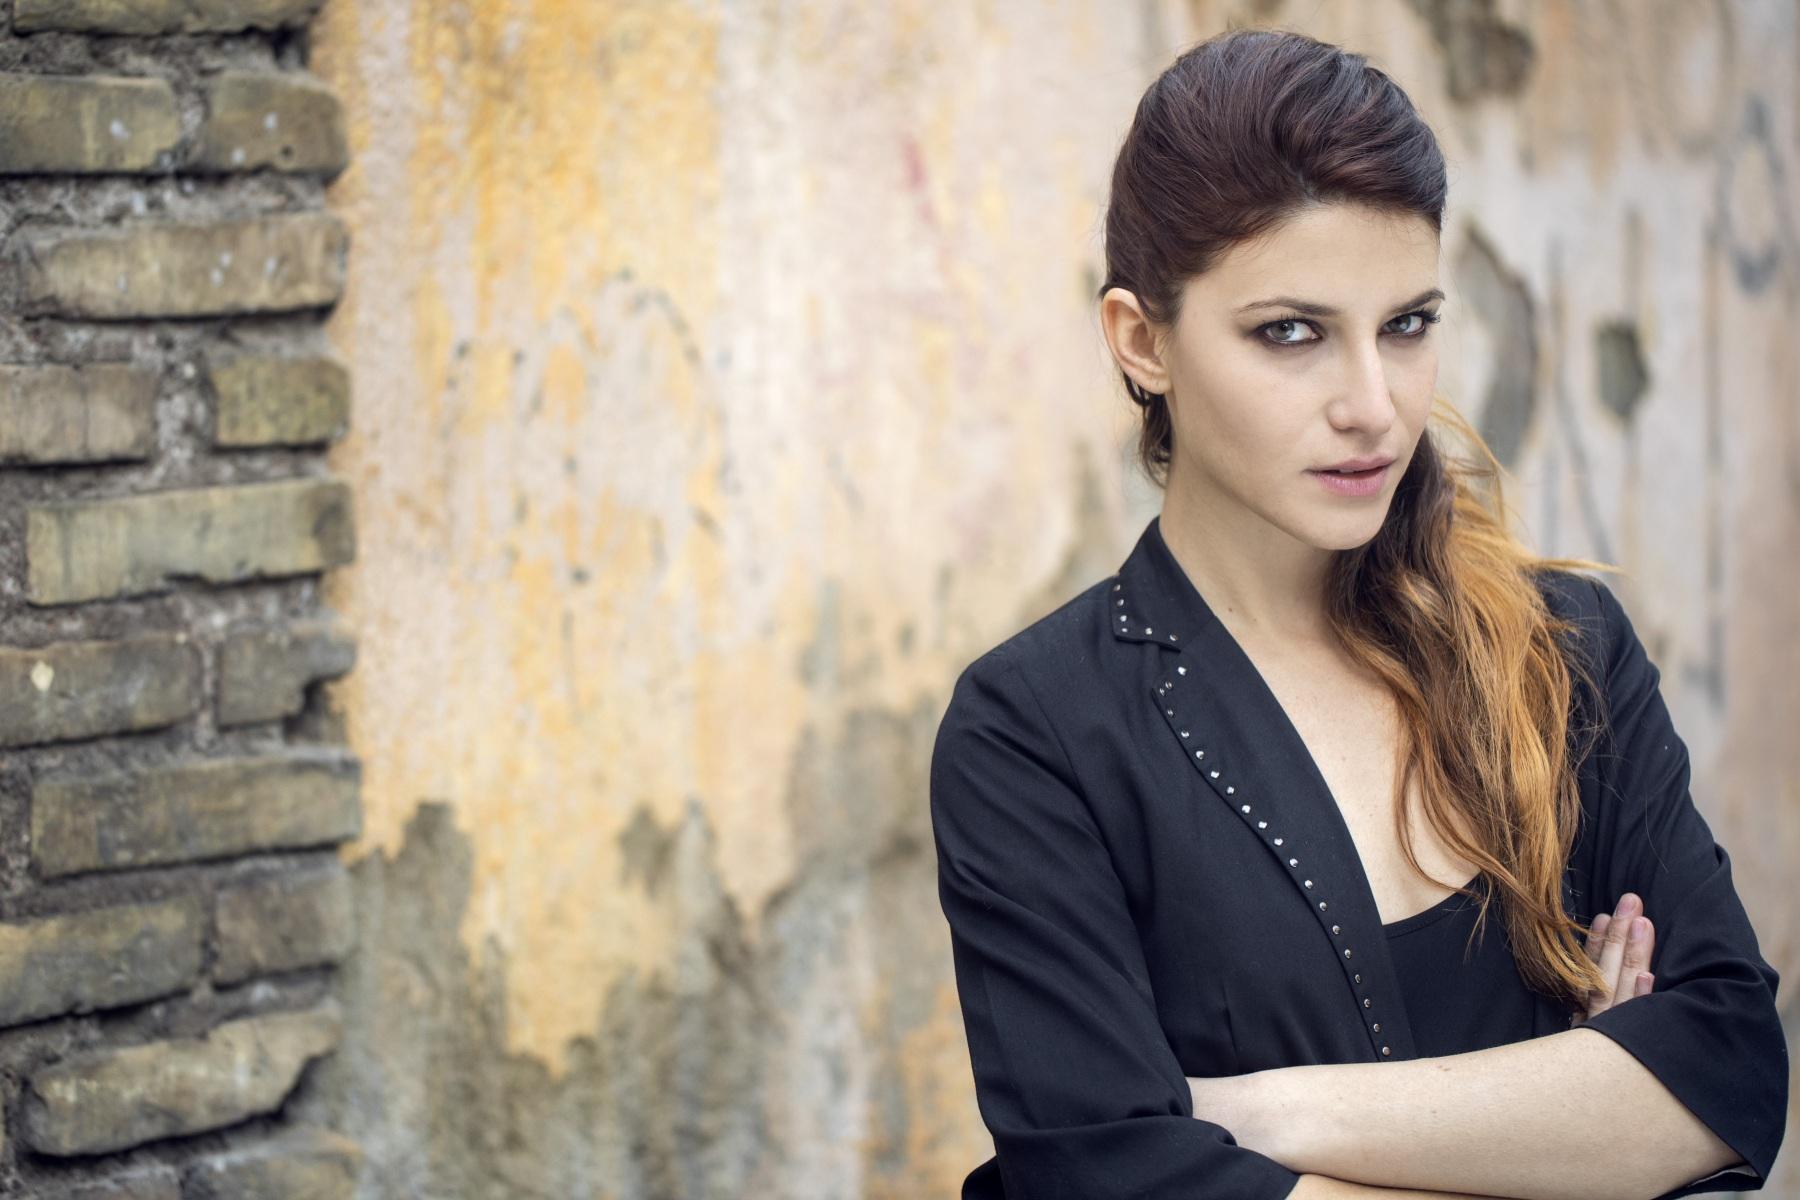 Fotografia di Andrea Ciccalè